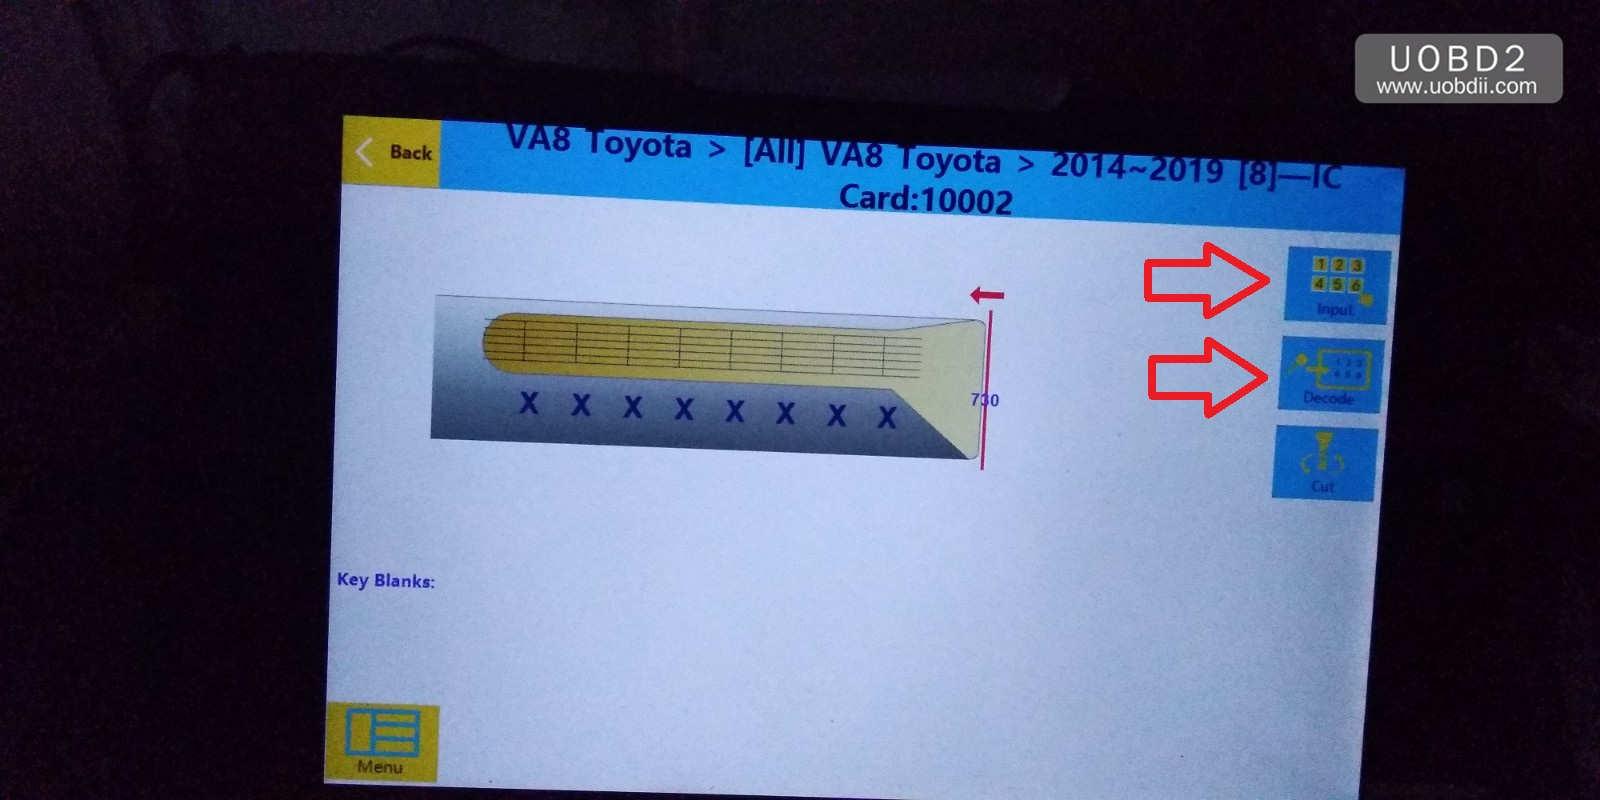 sec-e9z-create-new-key-for-va8-toyota-23